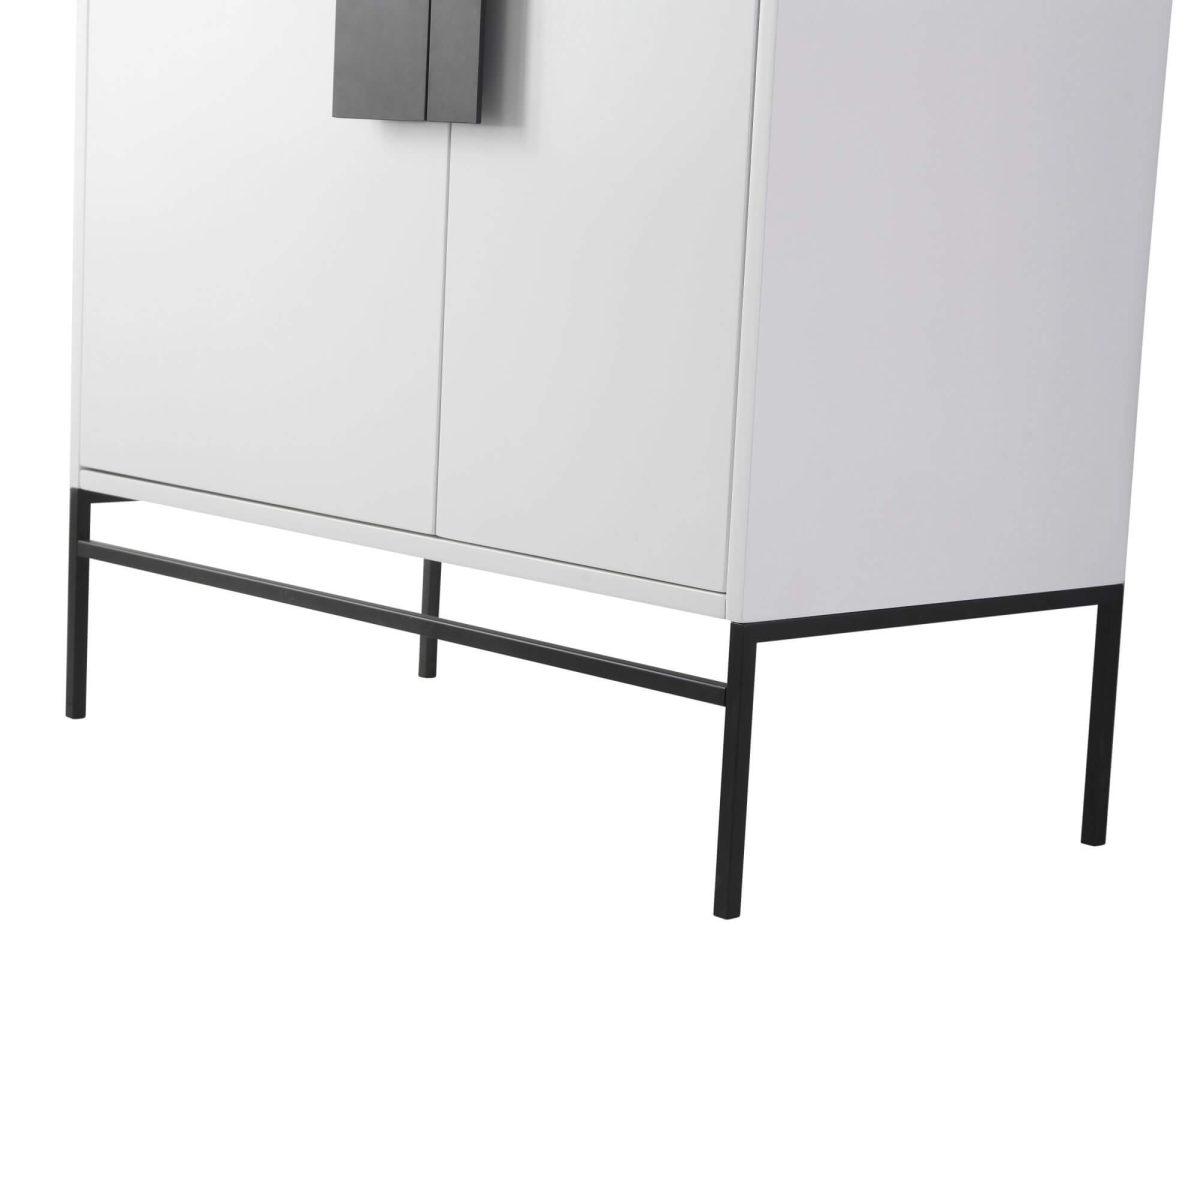 "Shawbridge 36"" Modern Bathroom Vanity  White with Black Hardware"